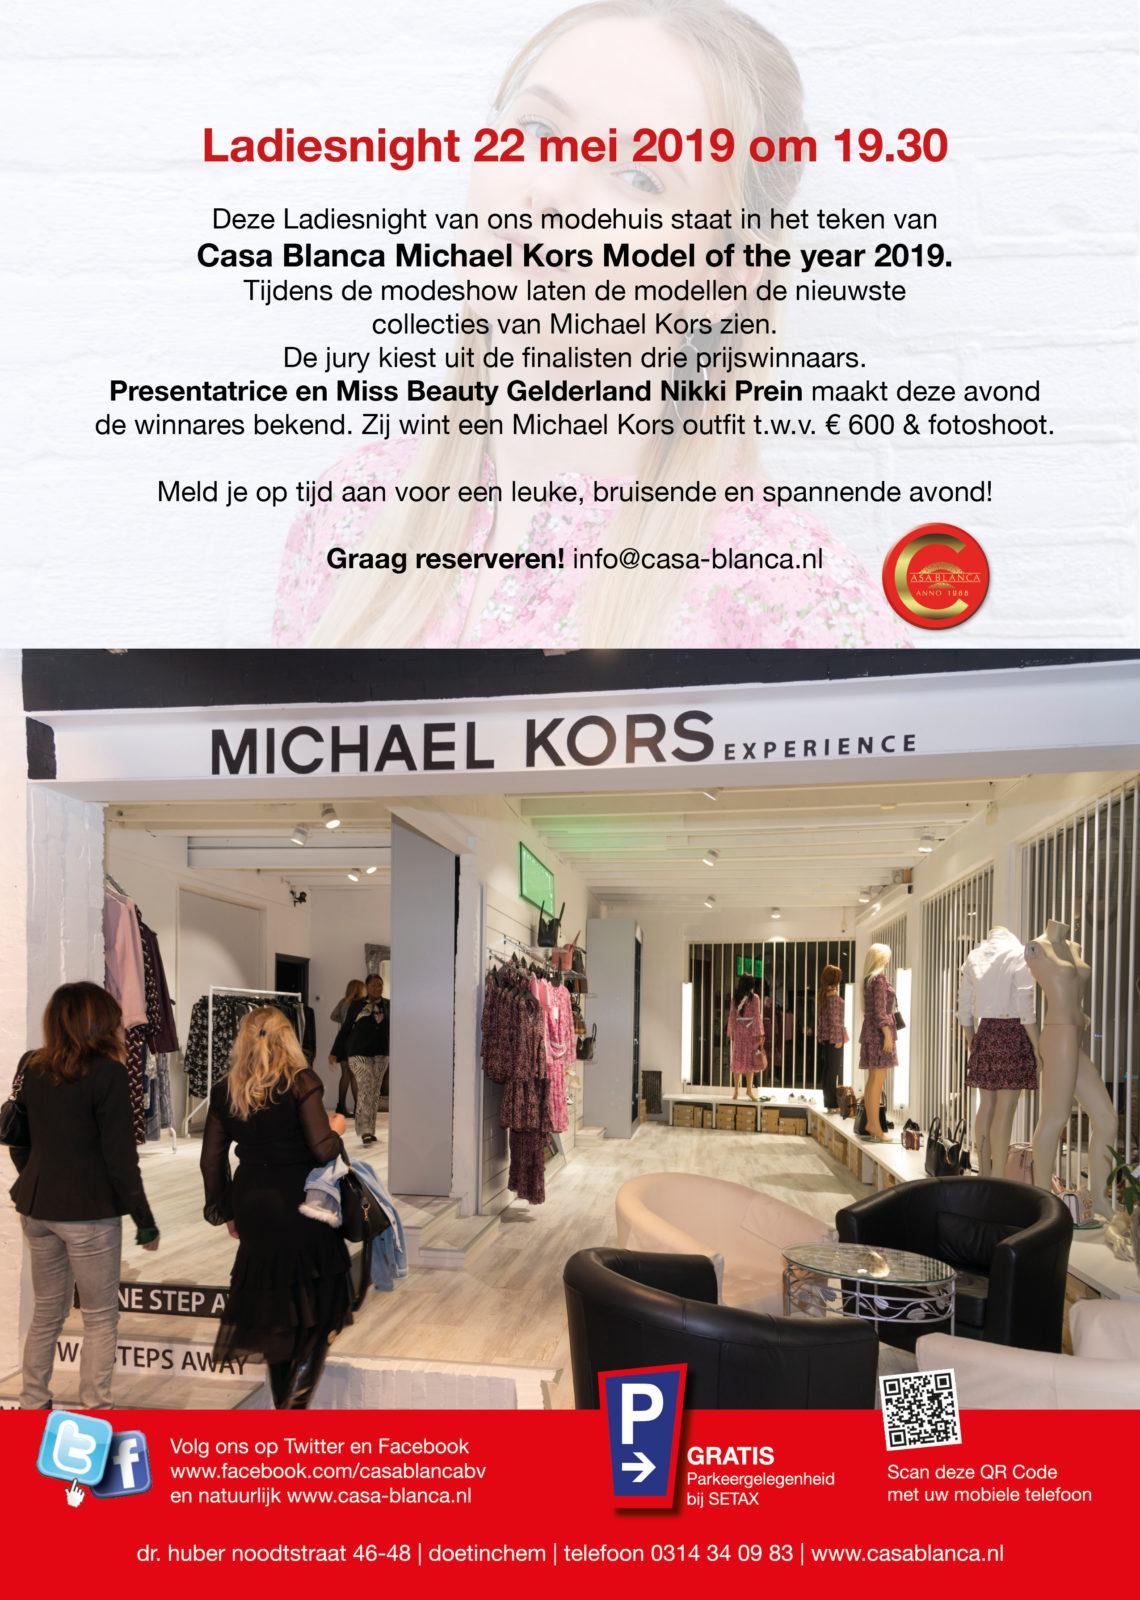 Ladies Night 22 mei 2019 Casa Blanca Mode Doetinchem